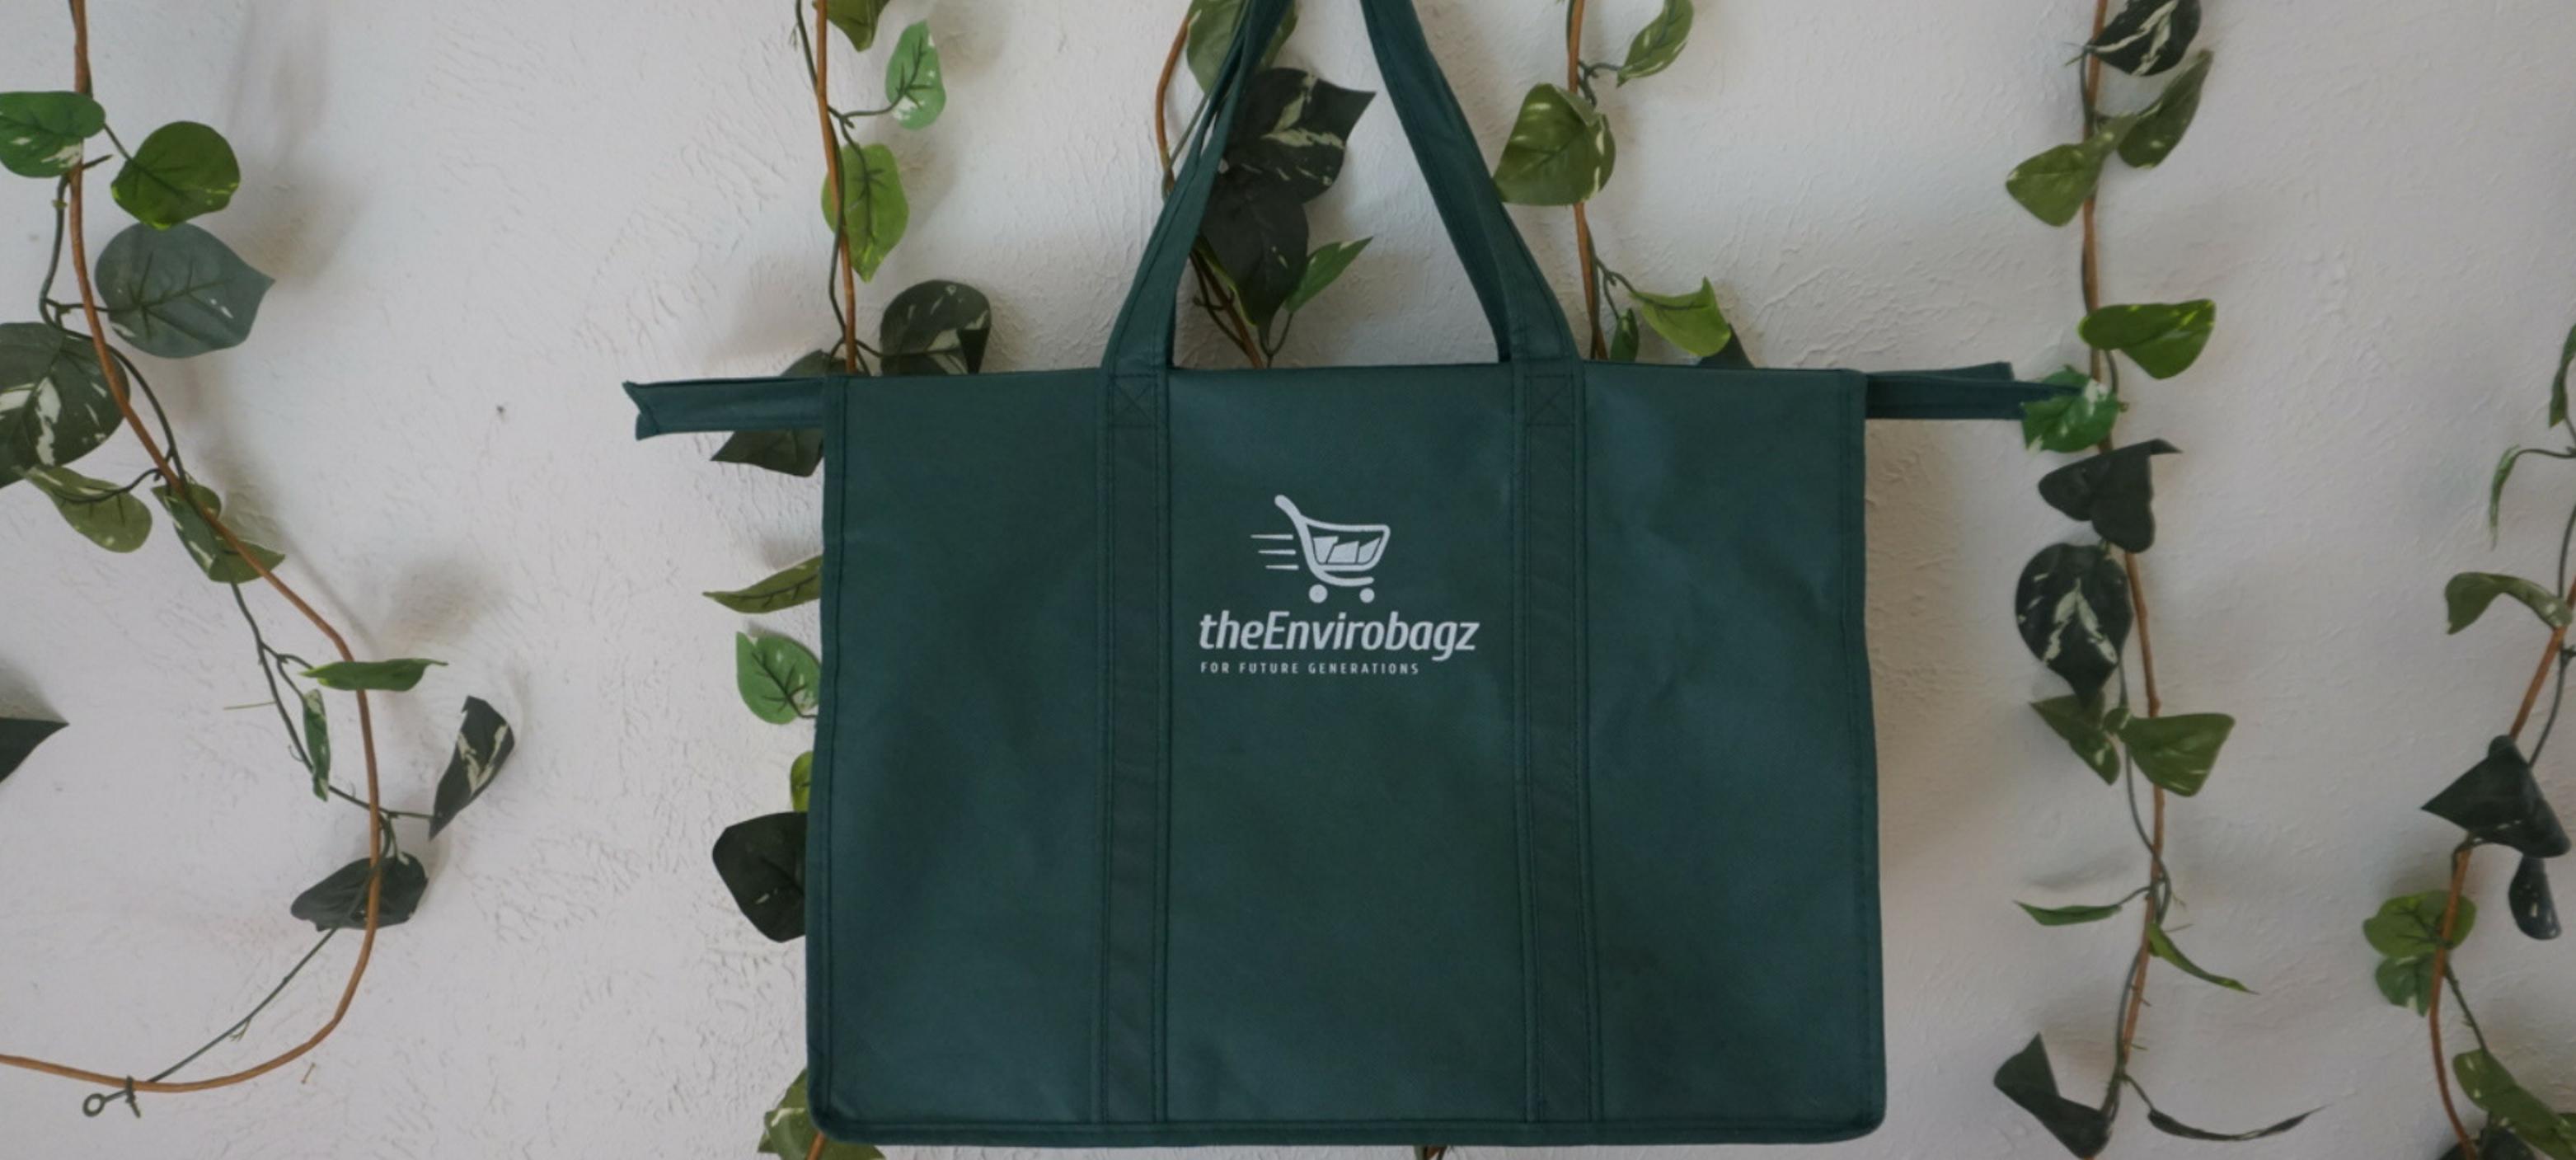 19 Plastic Alternatives |  Reusable Shopping Bags